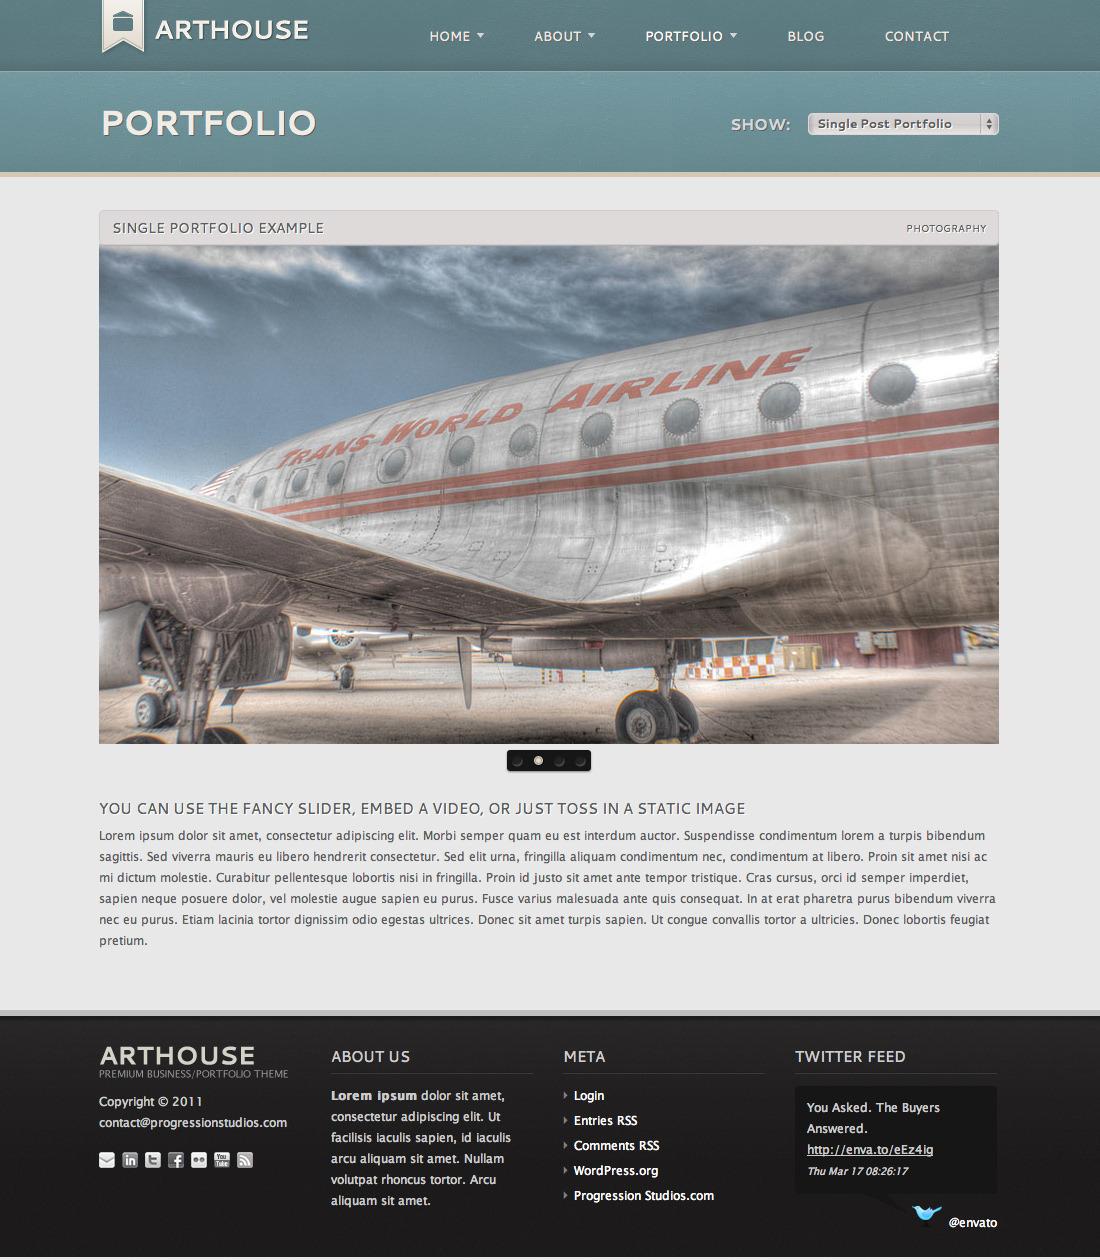 Arthouse - Premium Business & Portfolio Template